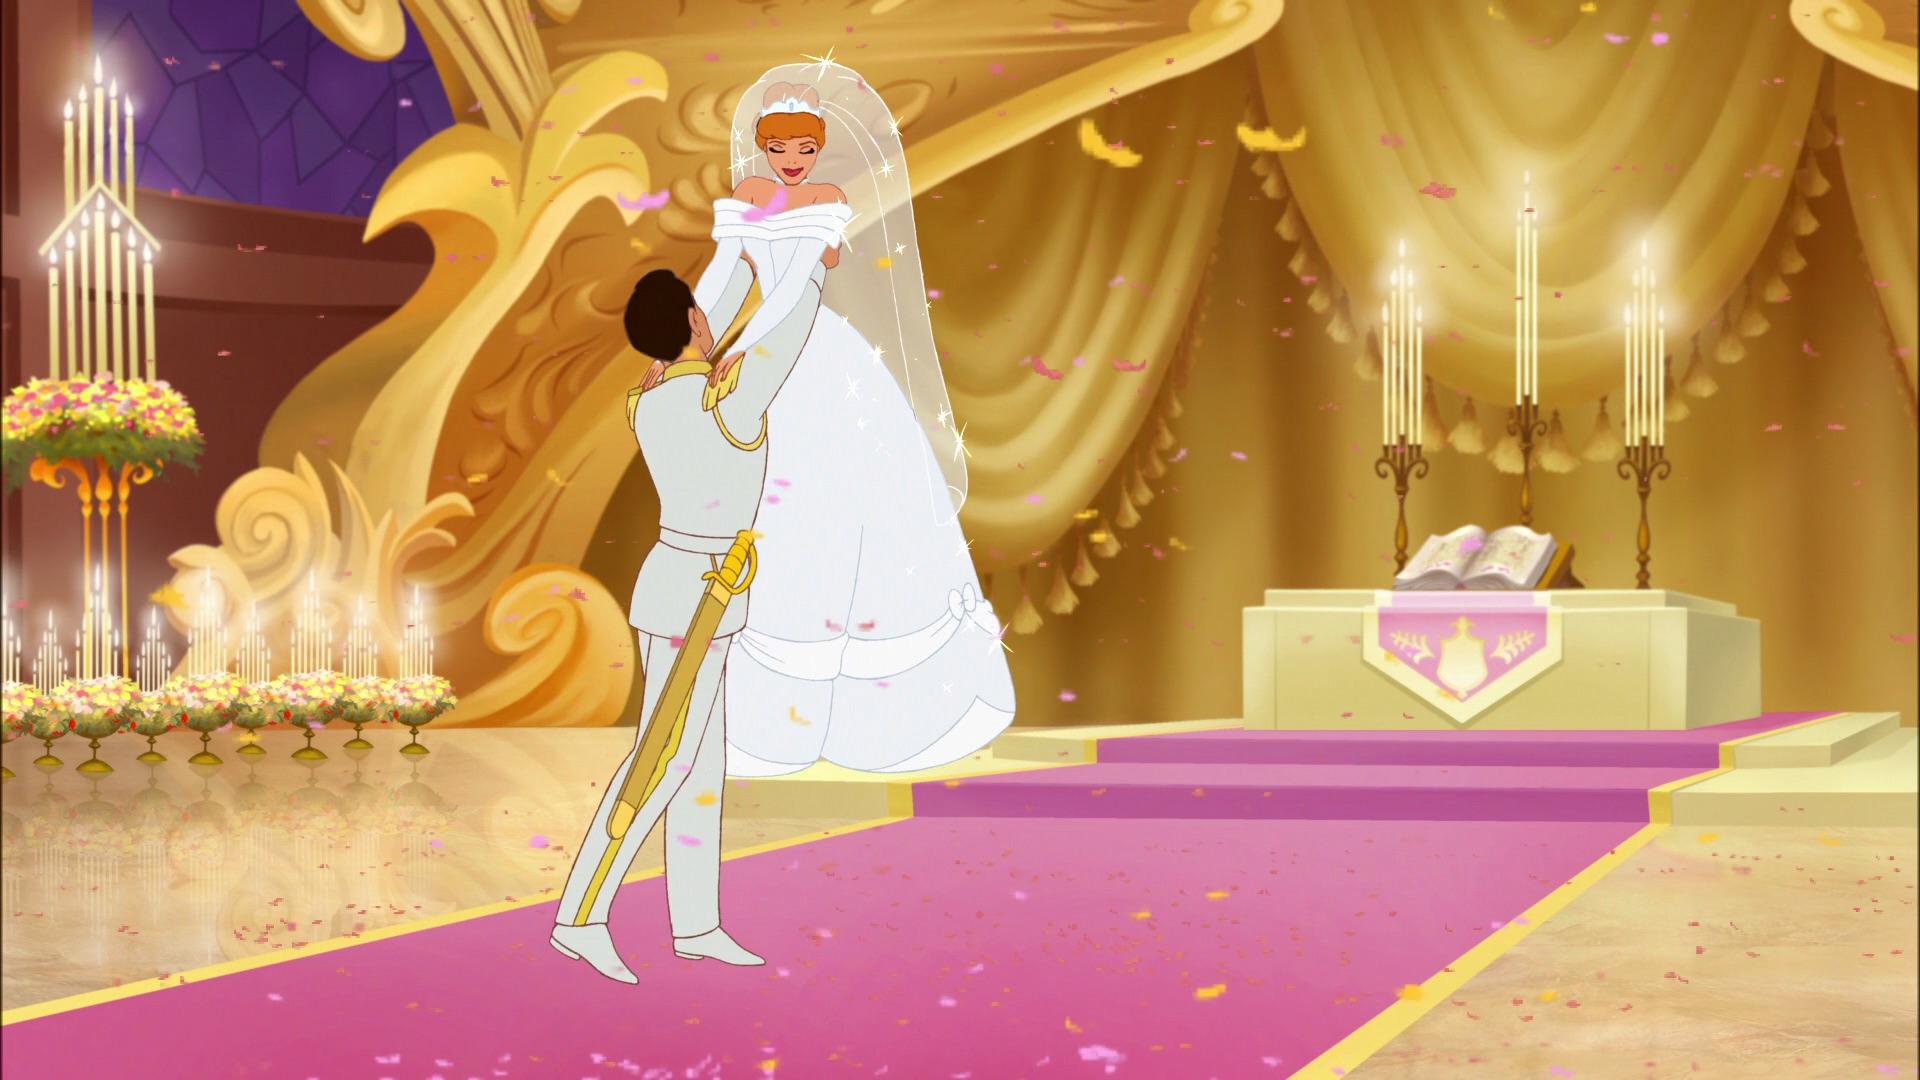 Cinderella Prince Charming A Twist In Time 2 Jpg